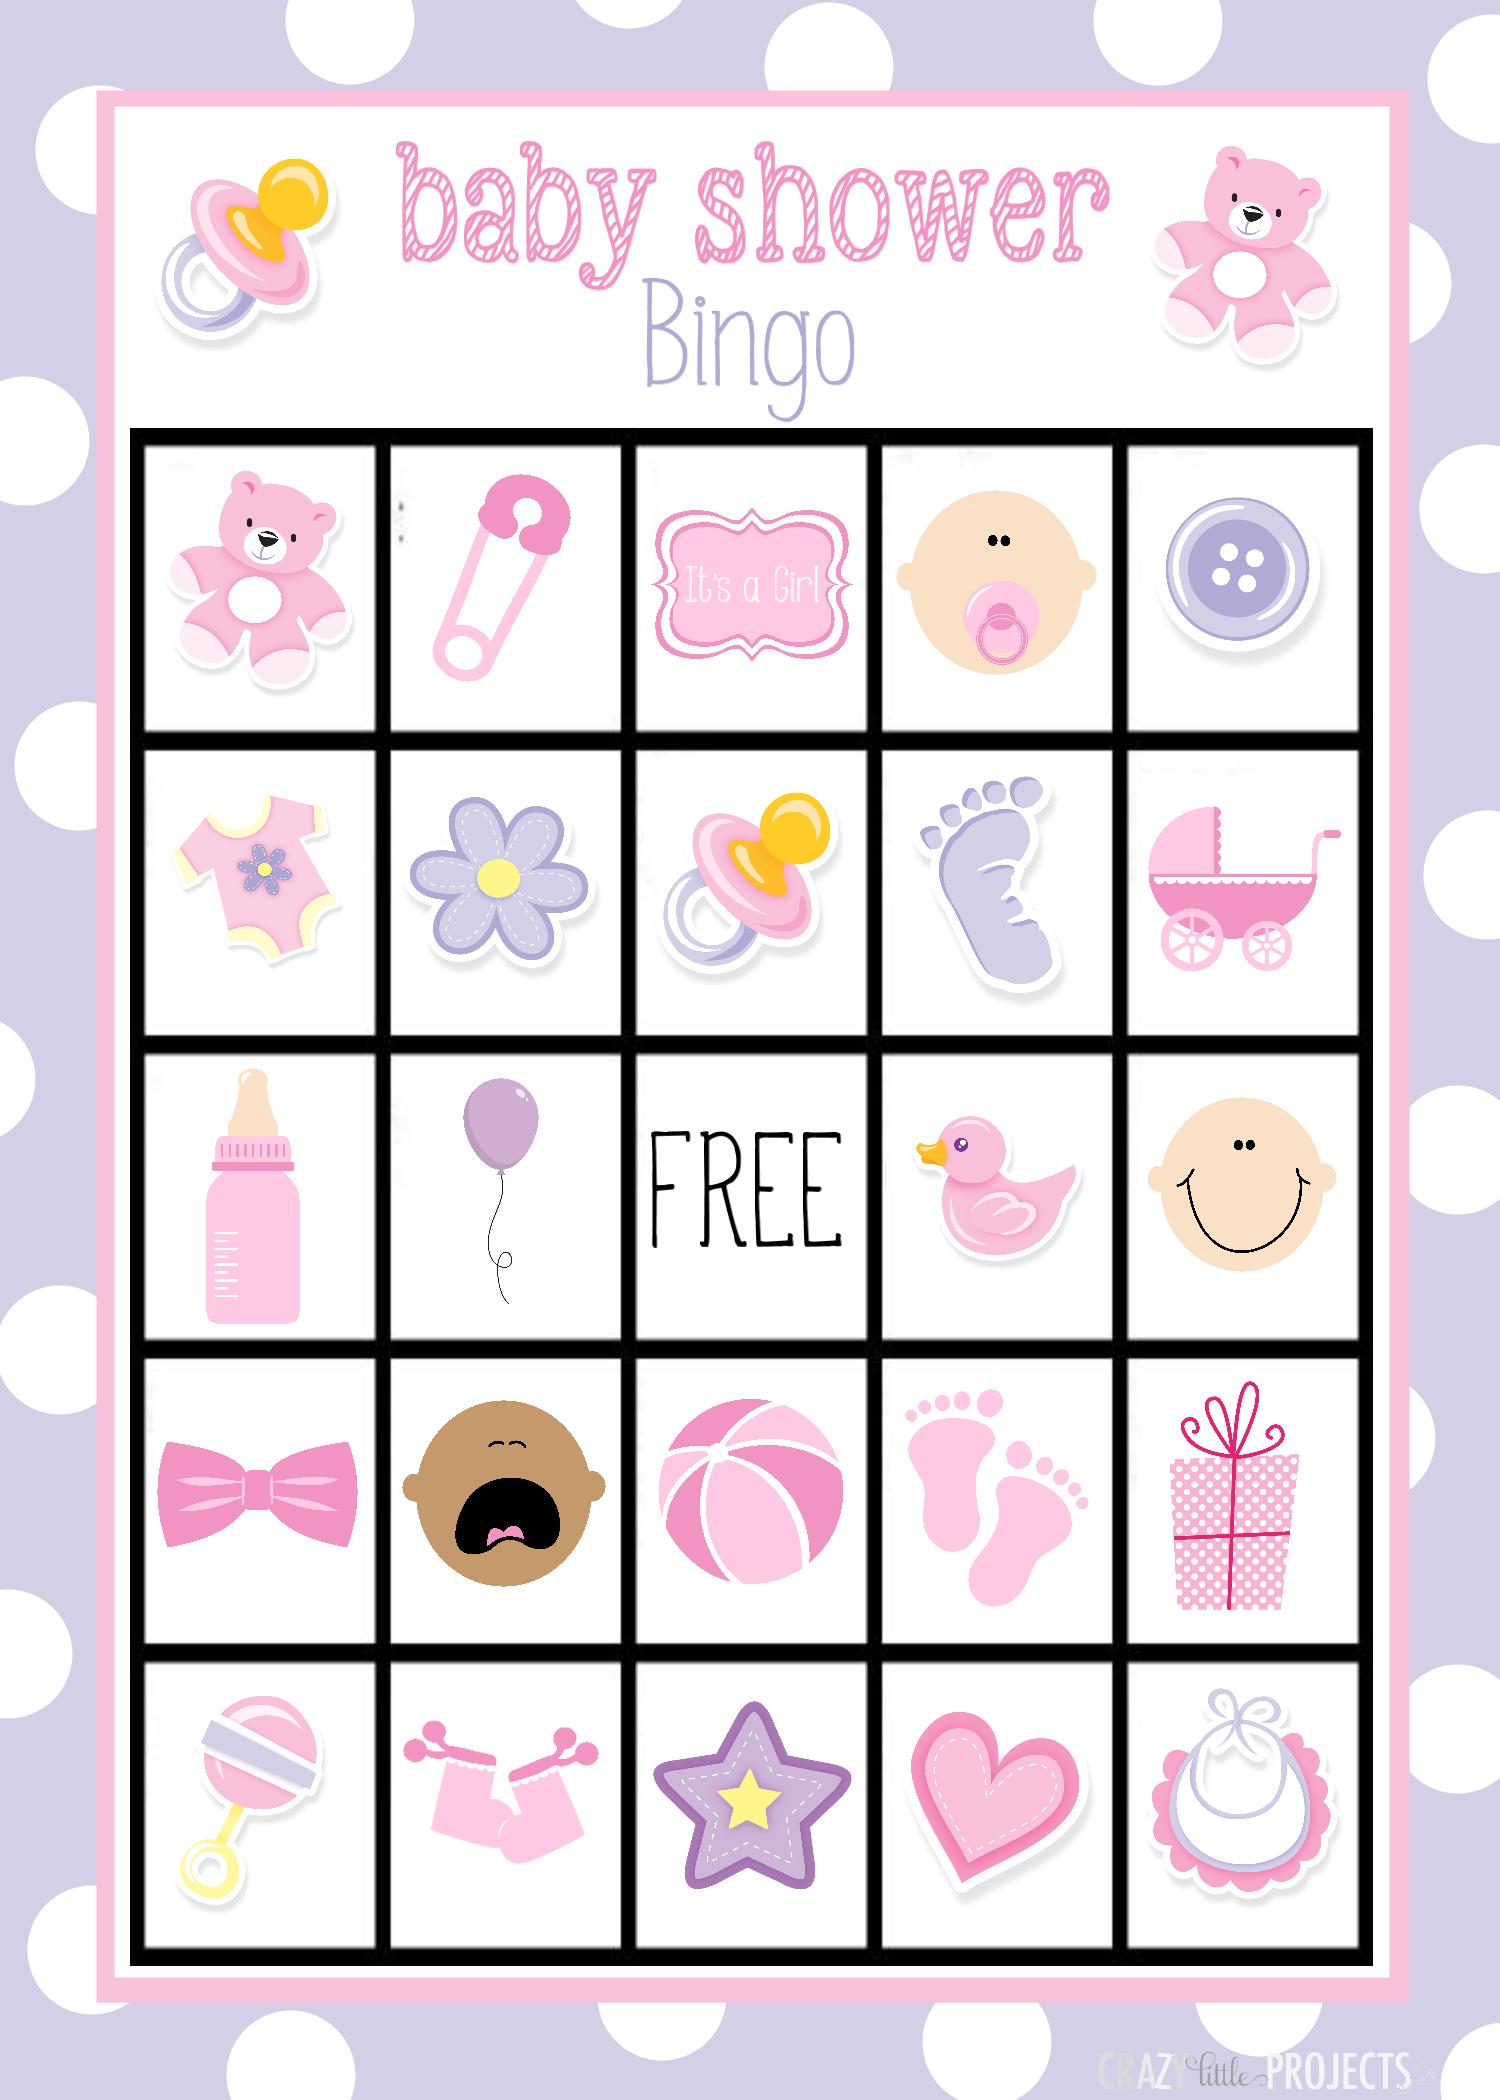 Baby Shower Bingo Cards - Free Printable Baby Shower Bingo For 50 People